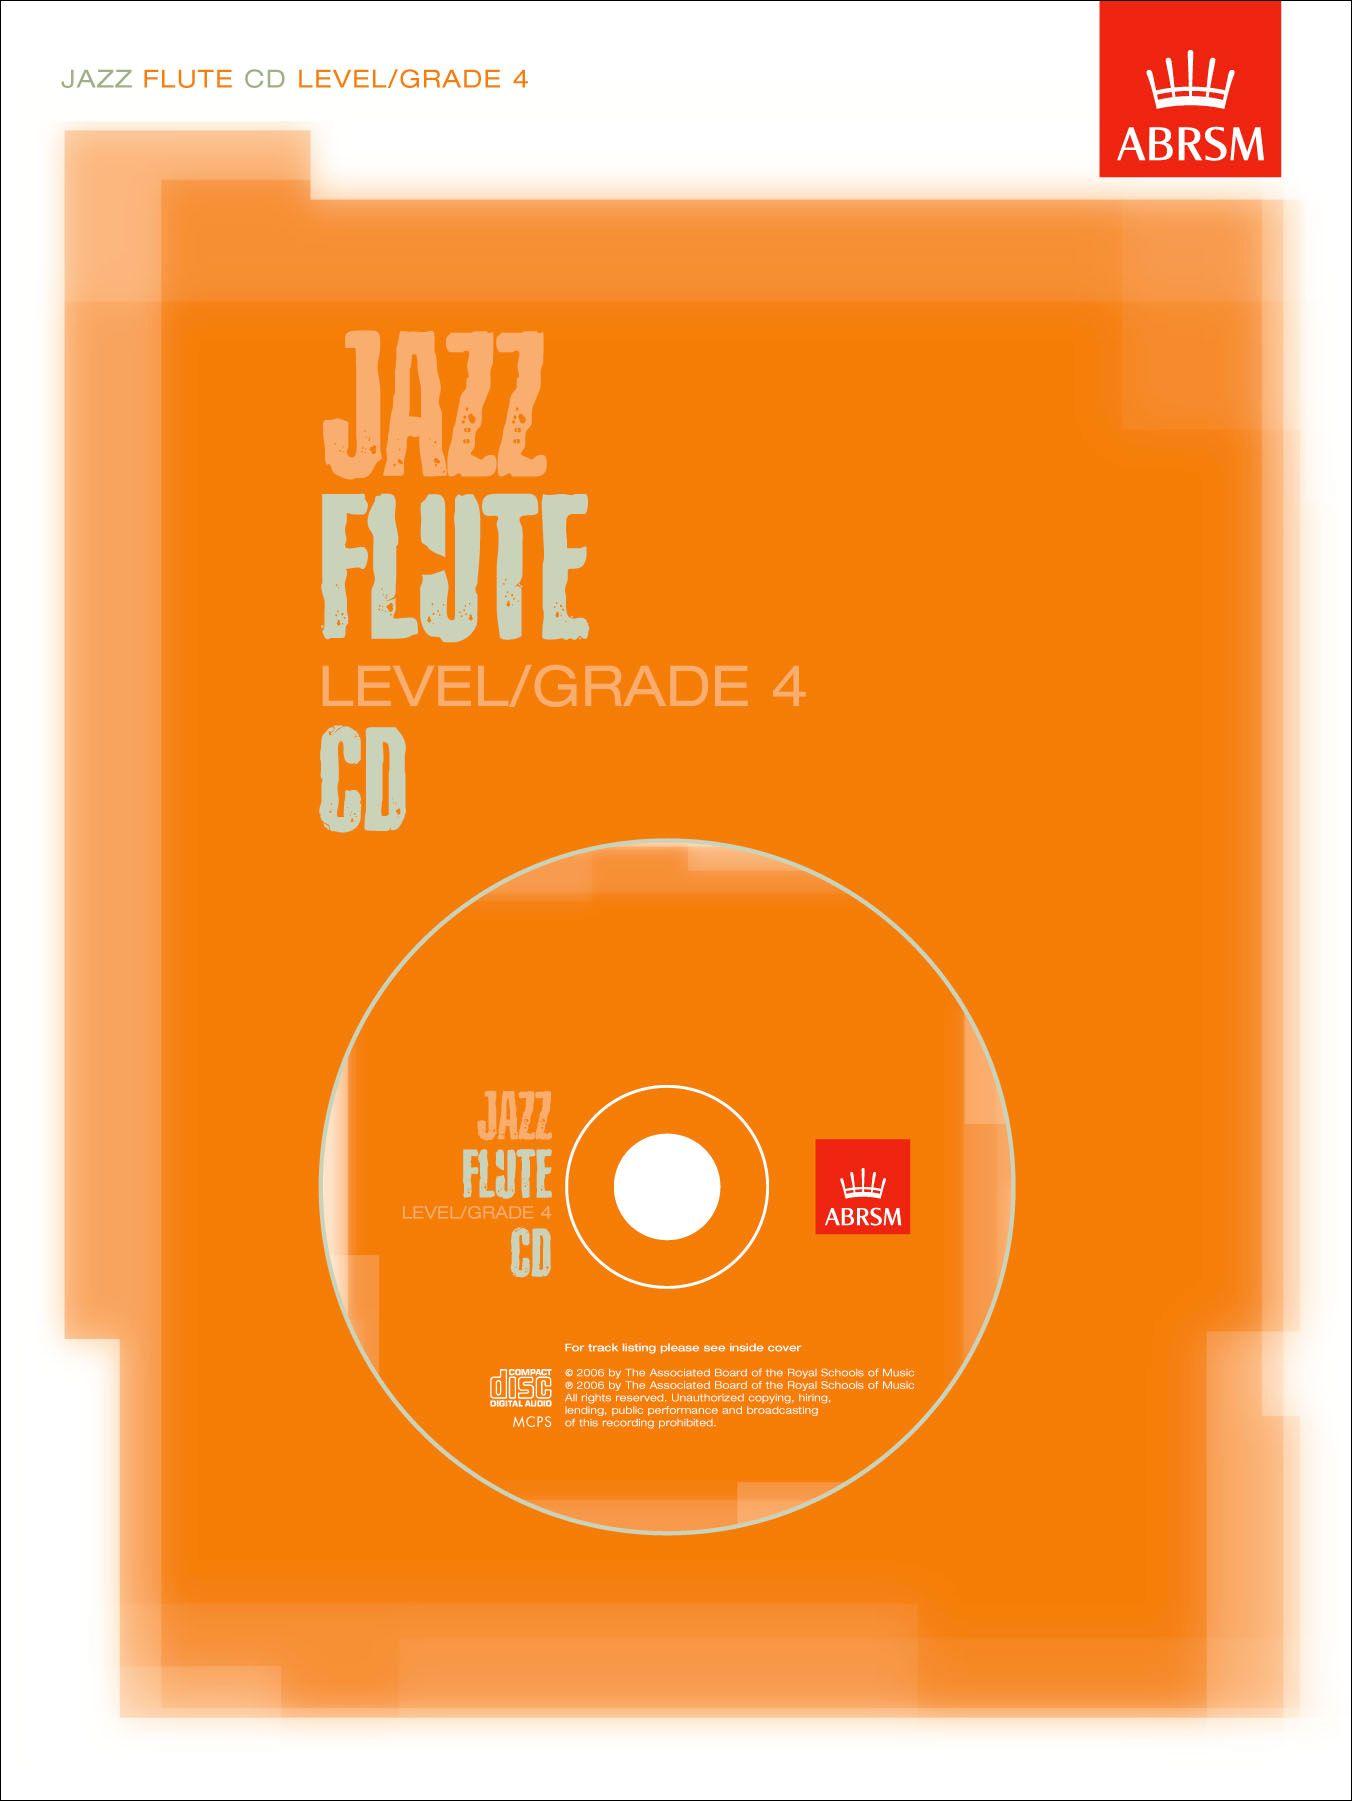 ABRSM Jazz Flute CD Level / Grade 4